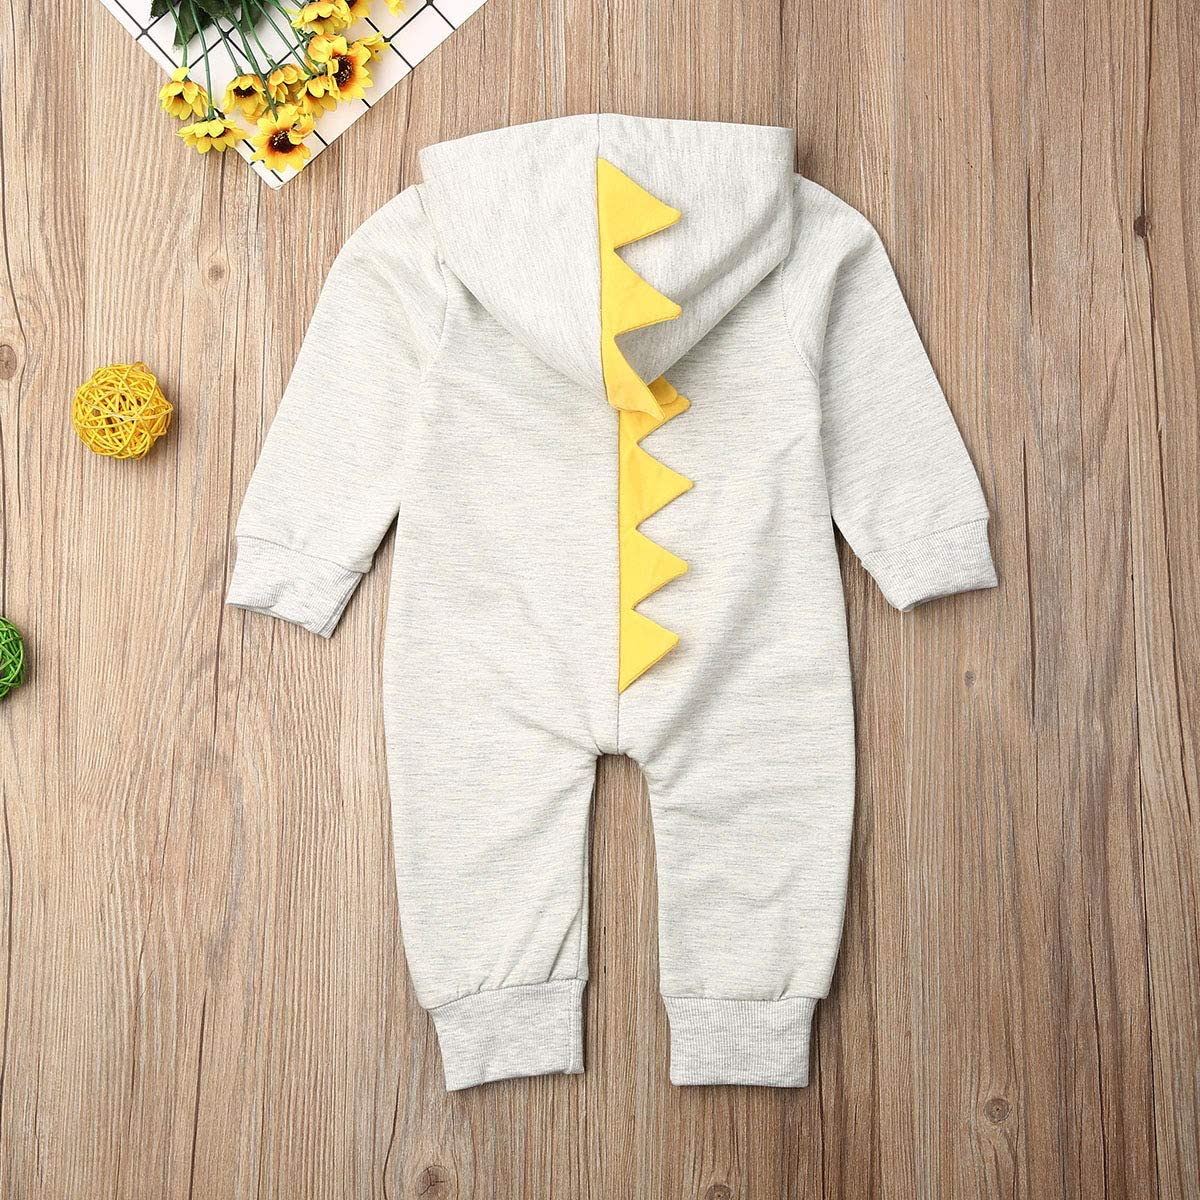 Uni is A Cone Graphic Newborn Baby Short Sleeve Bodysuit Romper Infant Summer Clothing Black